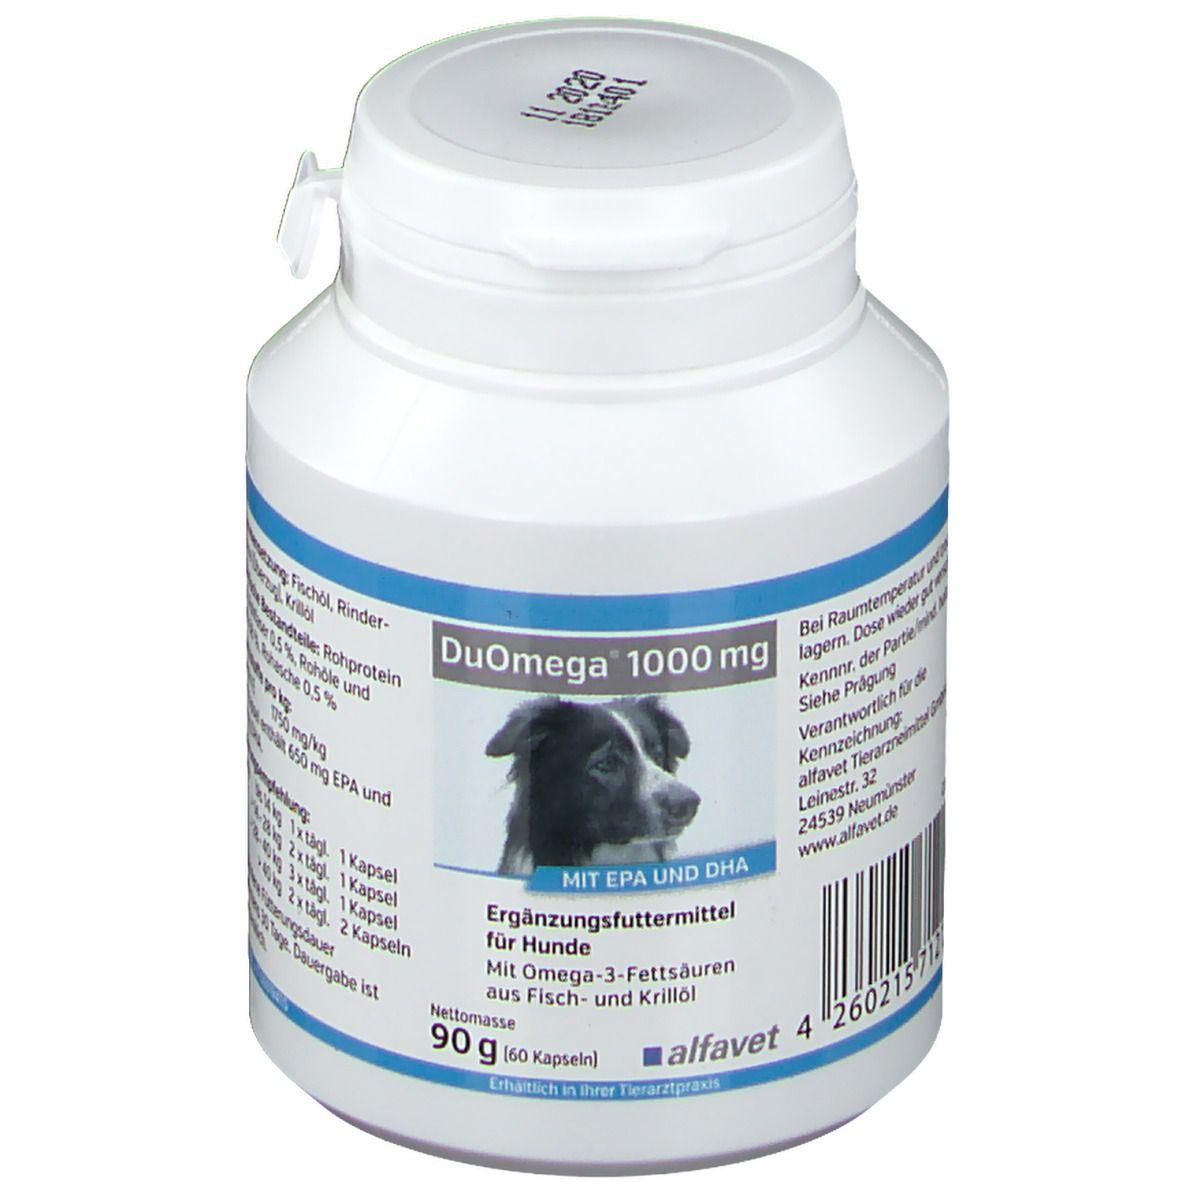 Image of DuOmega 1000 mg